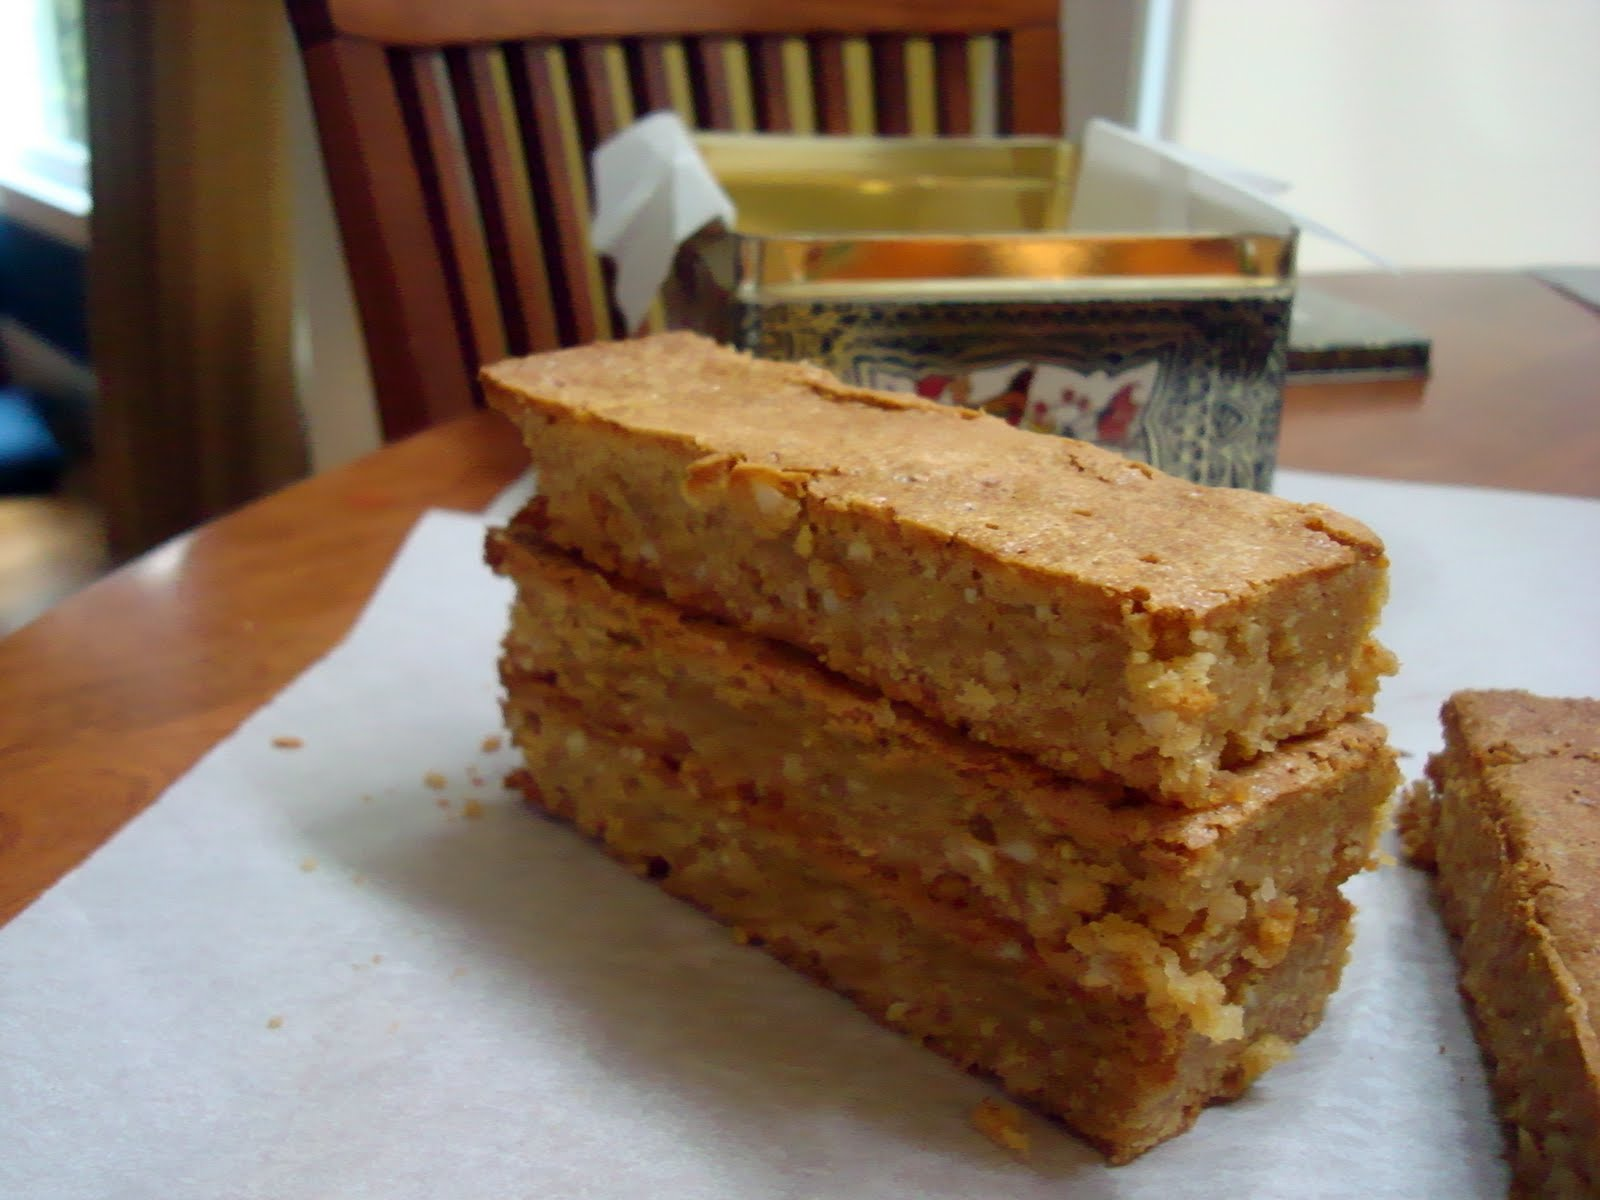 Sri Lanka Cake Recipes In Sinhala Language: Astheroshe's: Sri Lanka Love Cake